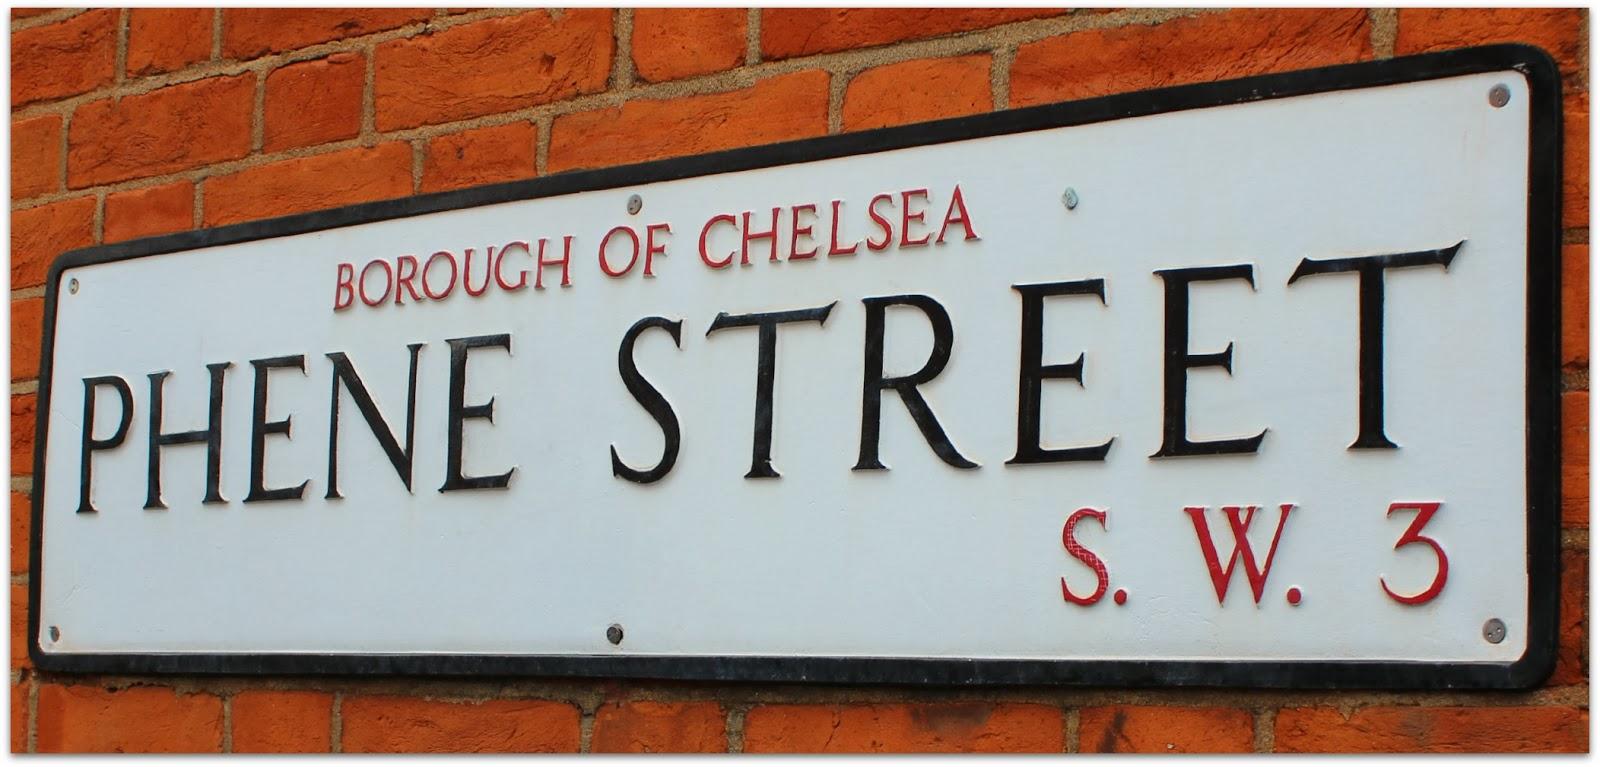 Phene Street